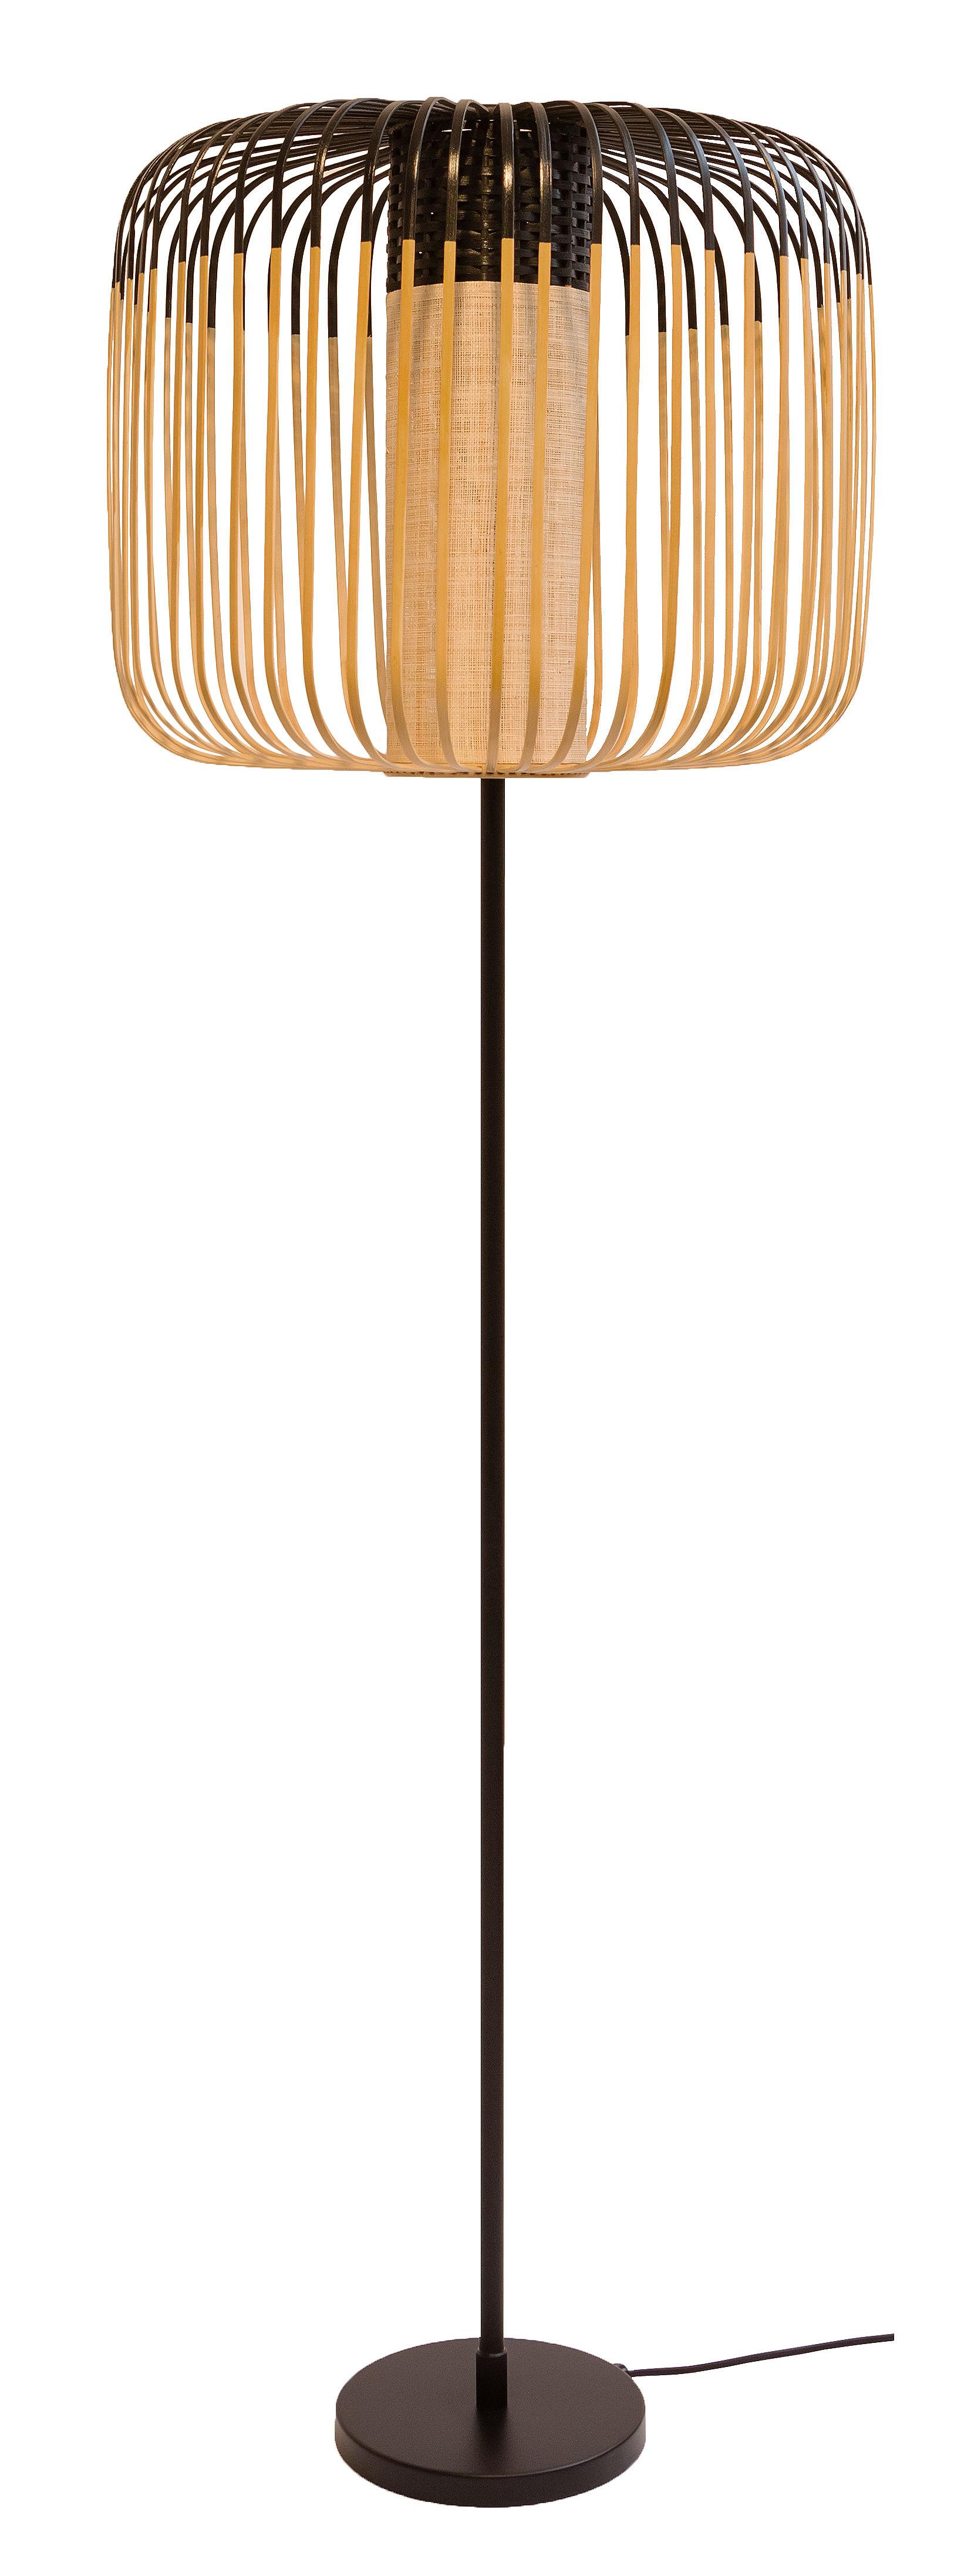 Illuminazione - Lampade da terra - Lampada a stelo Bamboo Light - / H 150 cm di Forestier - Nero / Naturale - Bambou naturel, Metallo